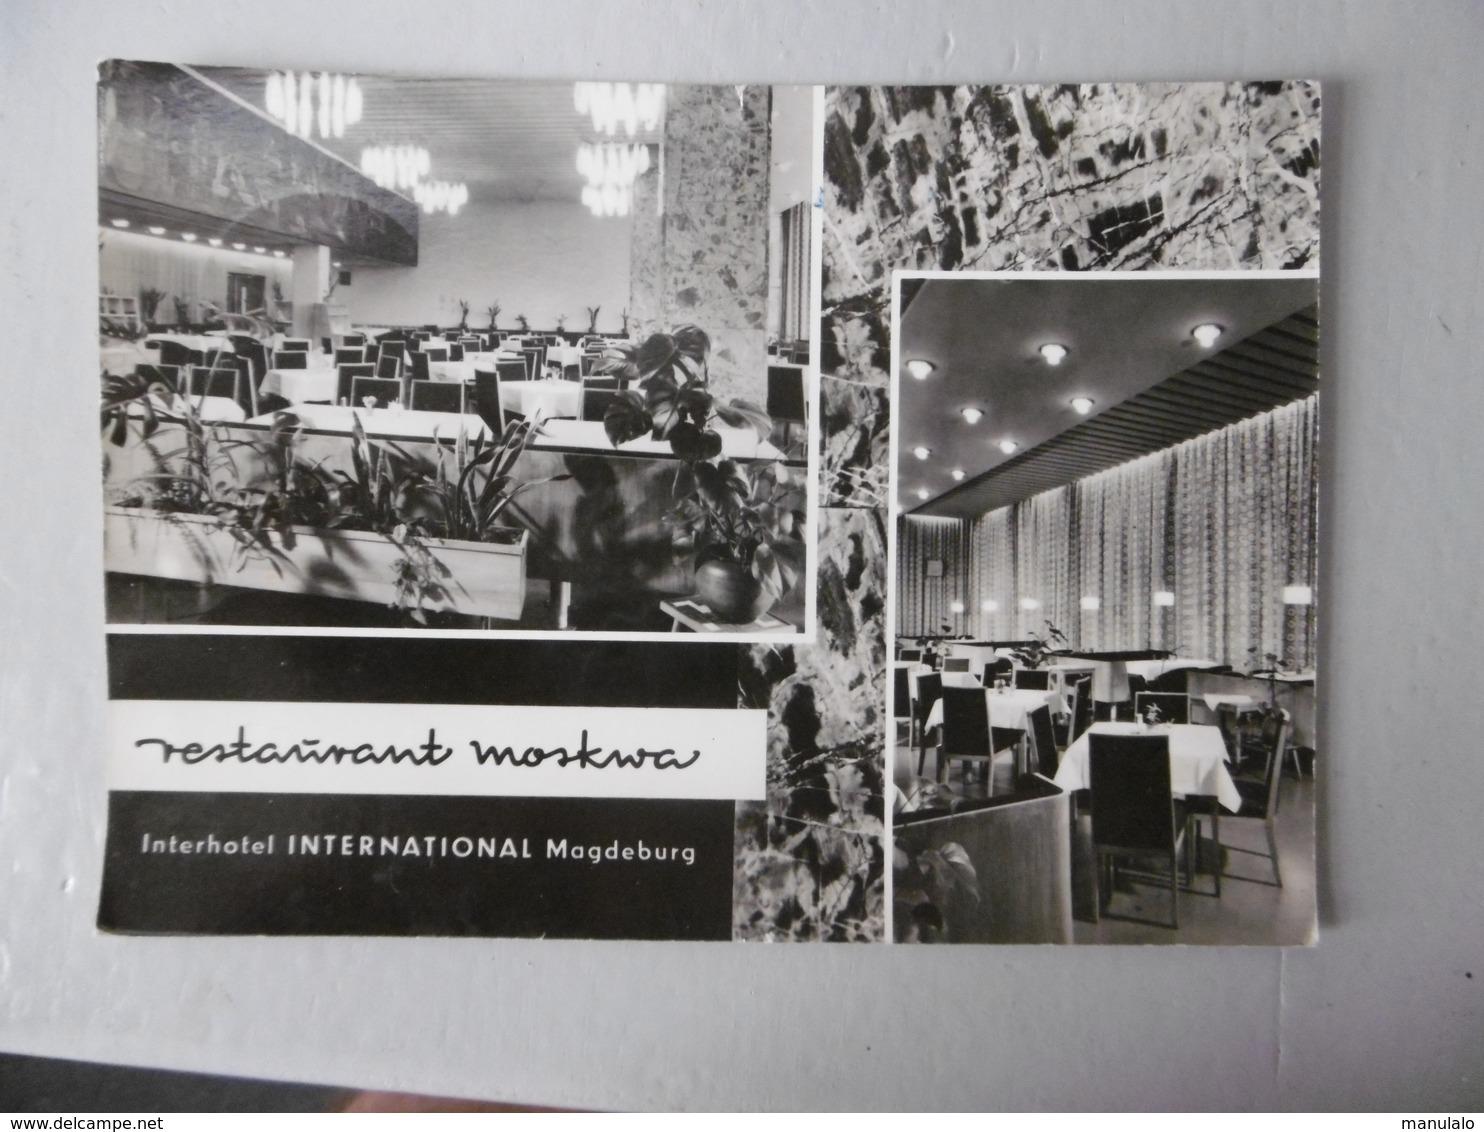 Magdeburg - Restaurant Moskwa - Interhotel International - Magdeburg